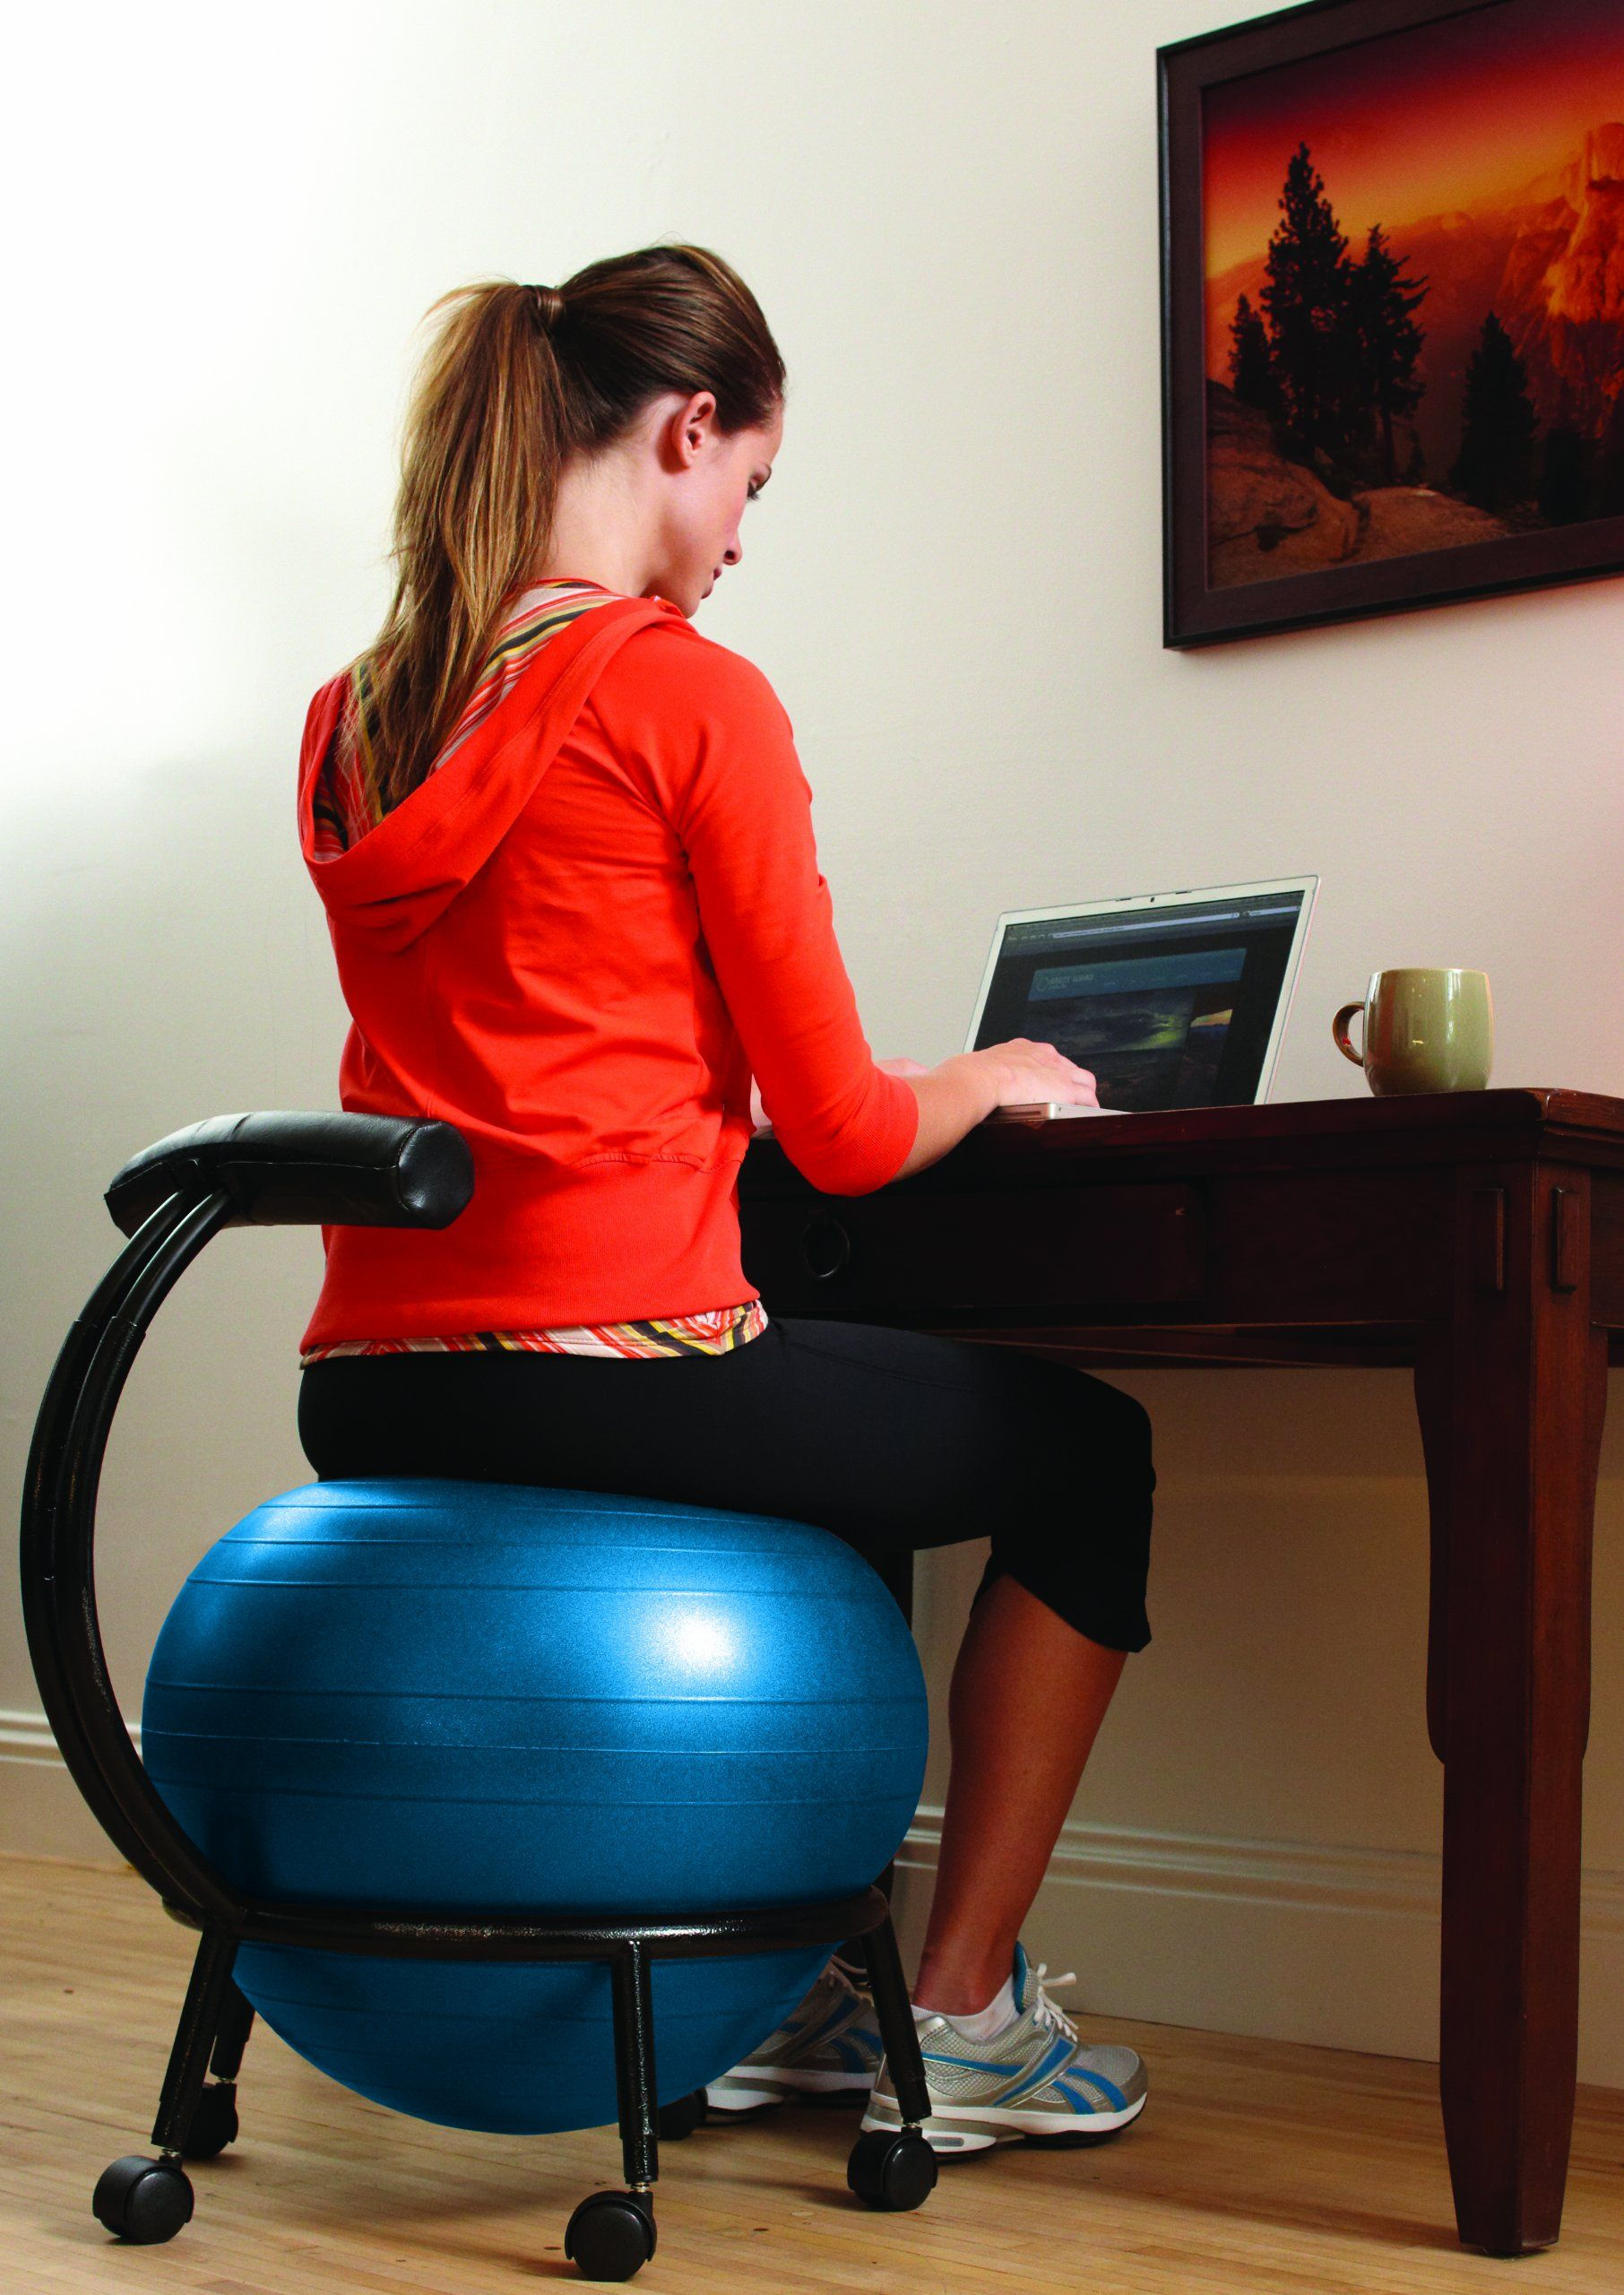 Amazon Com Gaiam Custom Fit Adjustable Balance Ball Chair Exercise Balls Sports Outdoors Balance Ball Chair Ball Chair Balance Ball